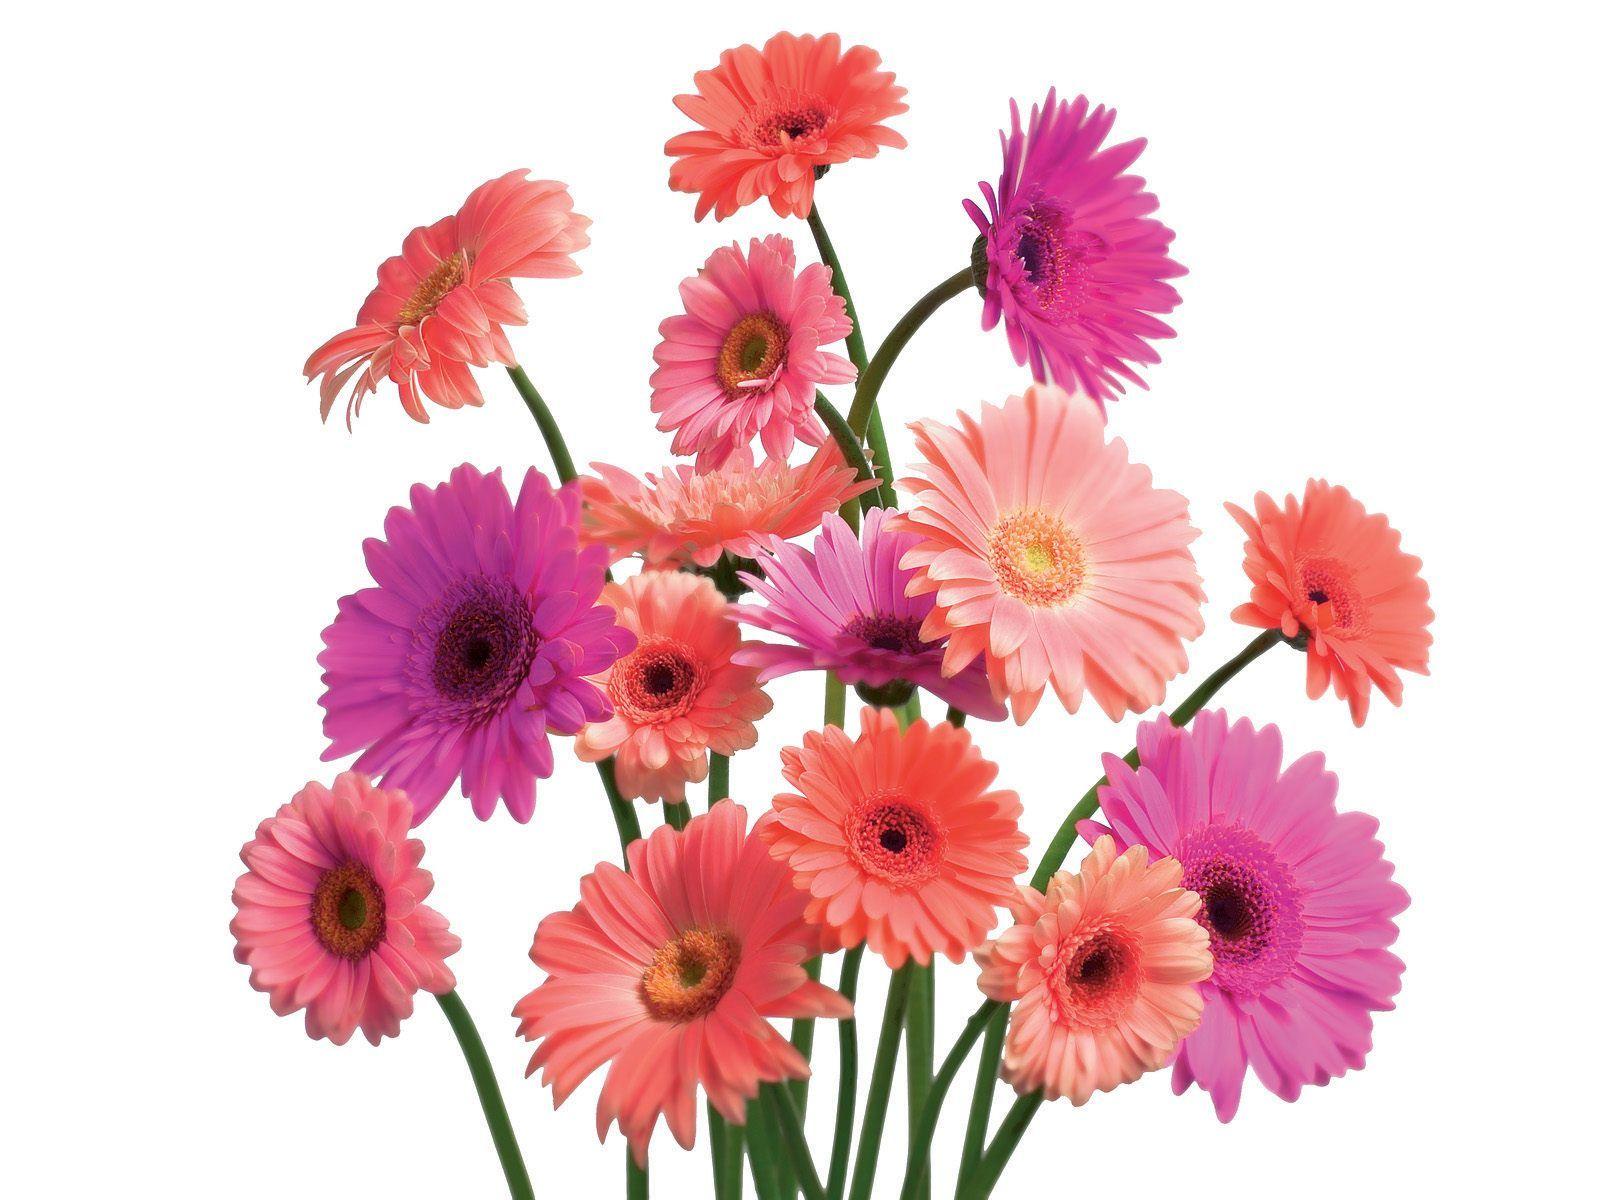 Flower HD PNG - 137394